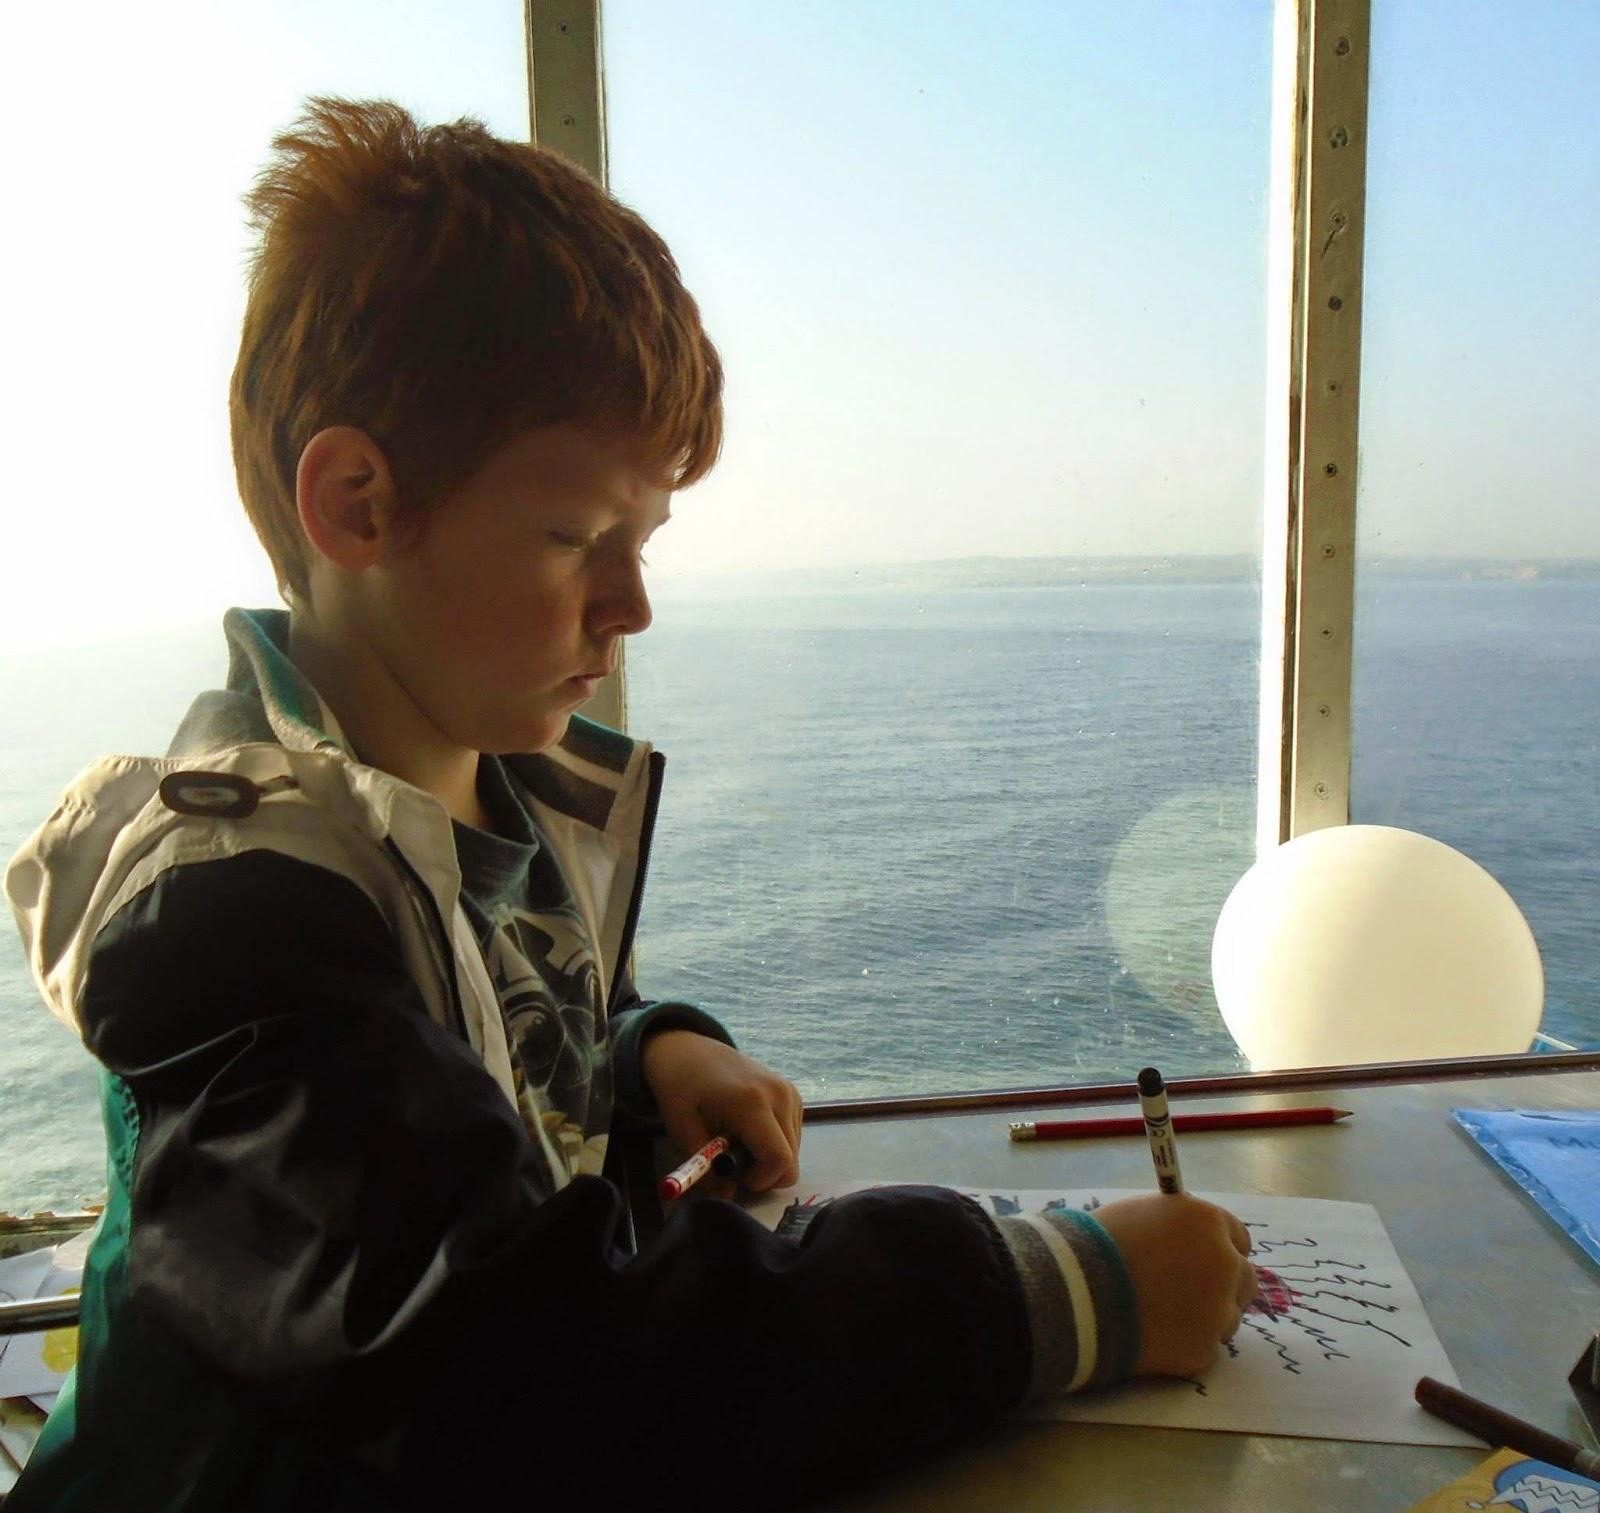 Breakfast in the lighthouse cafe aboard DFDS Seaways